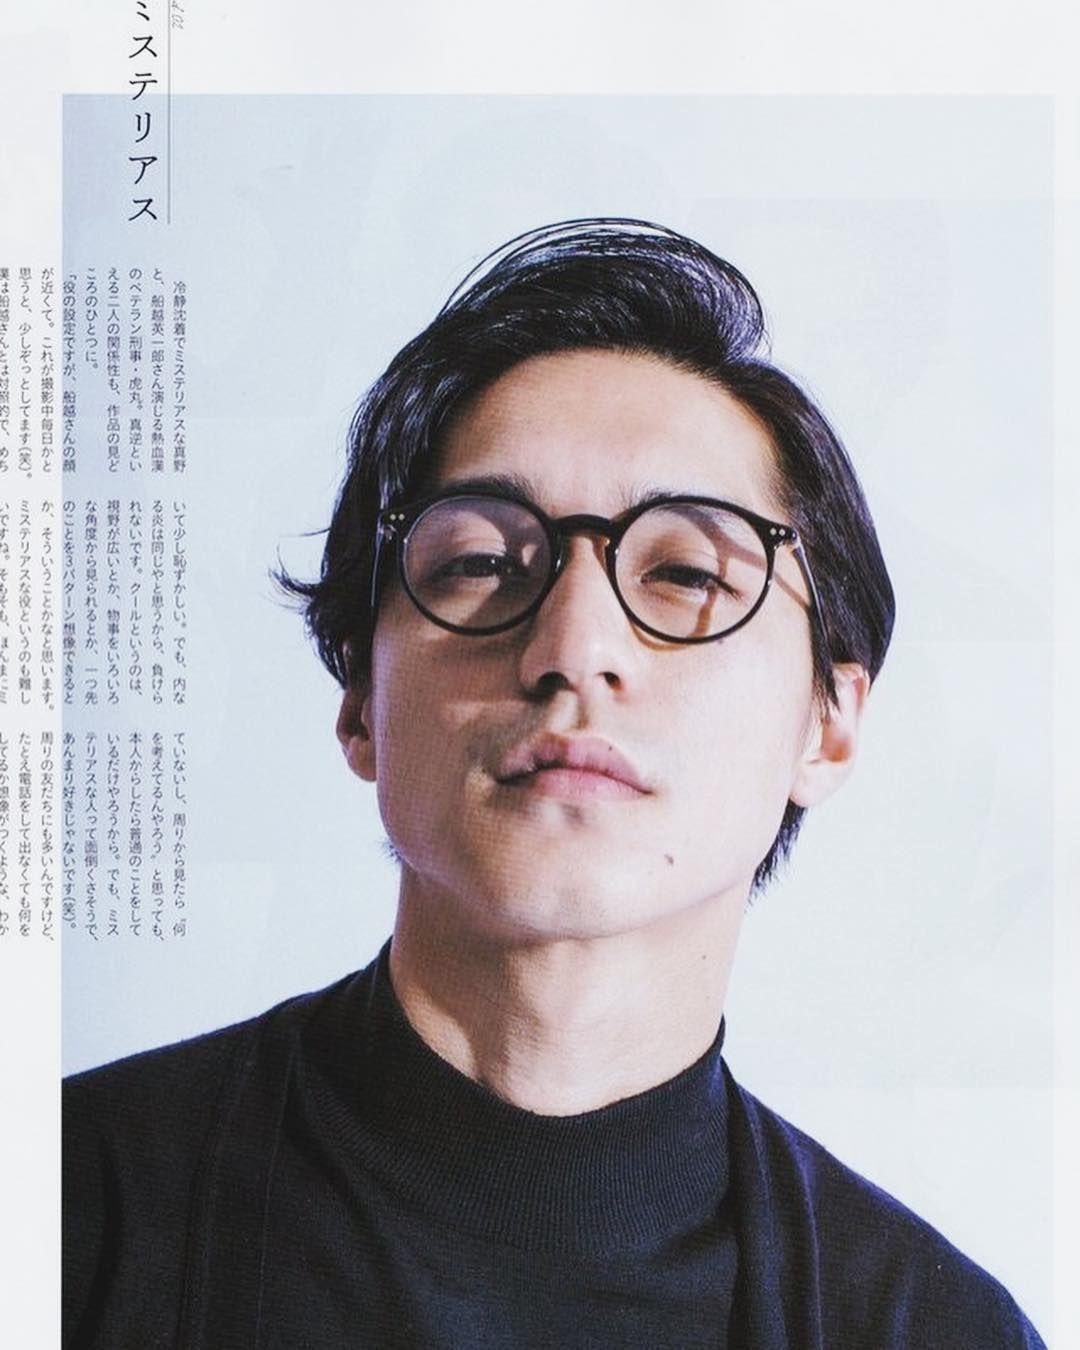 錦戸 亮 instagram